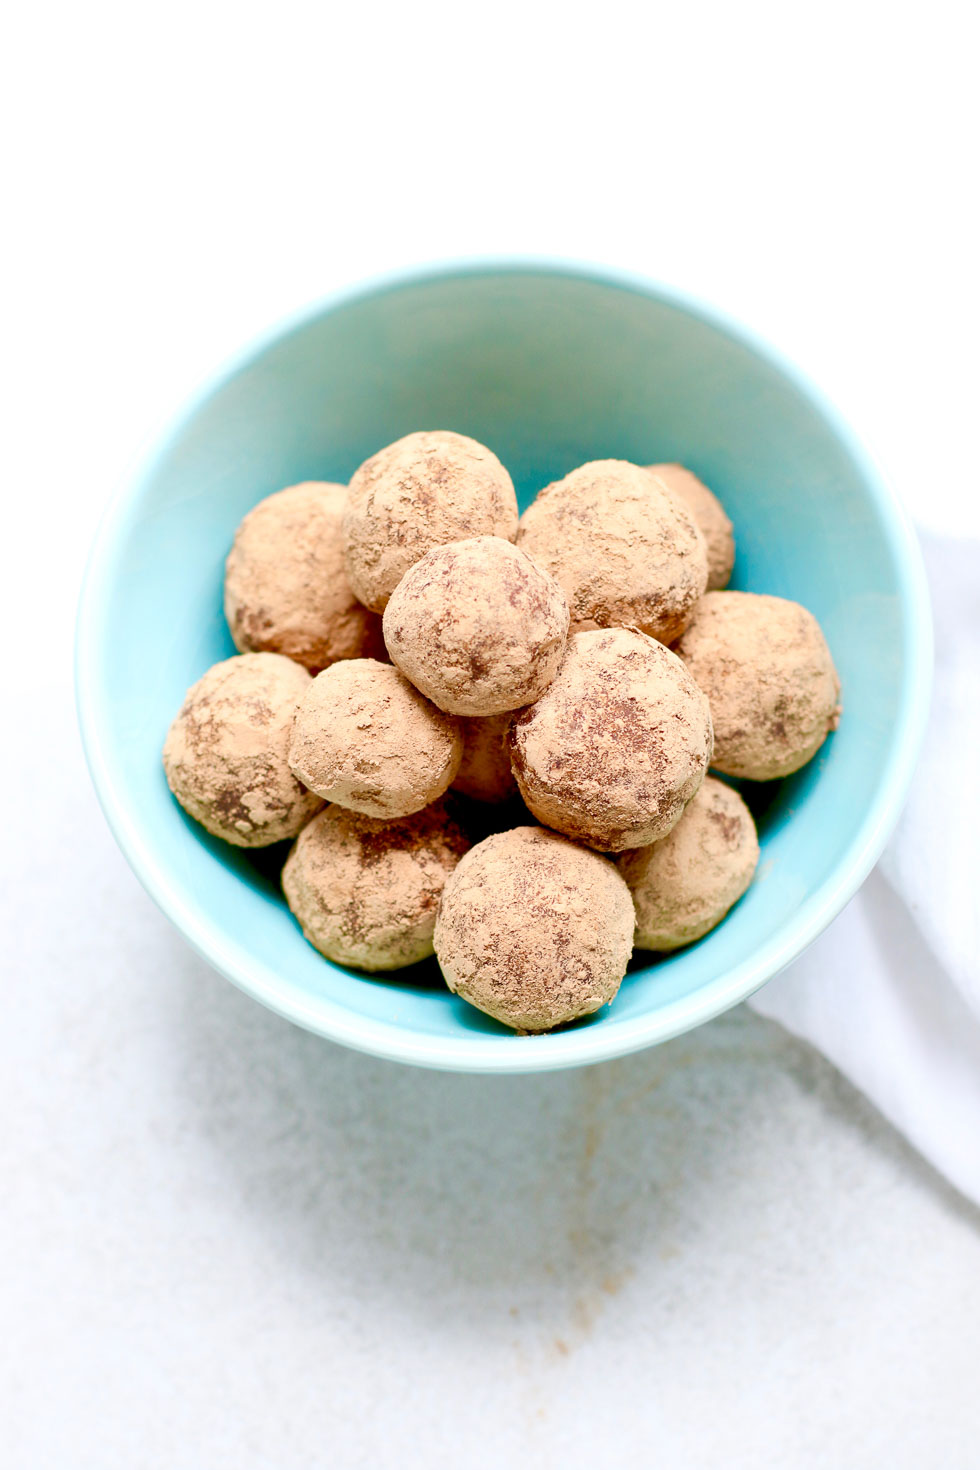 Vegan Chocolate Almond Truffles